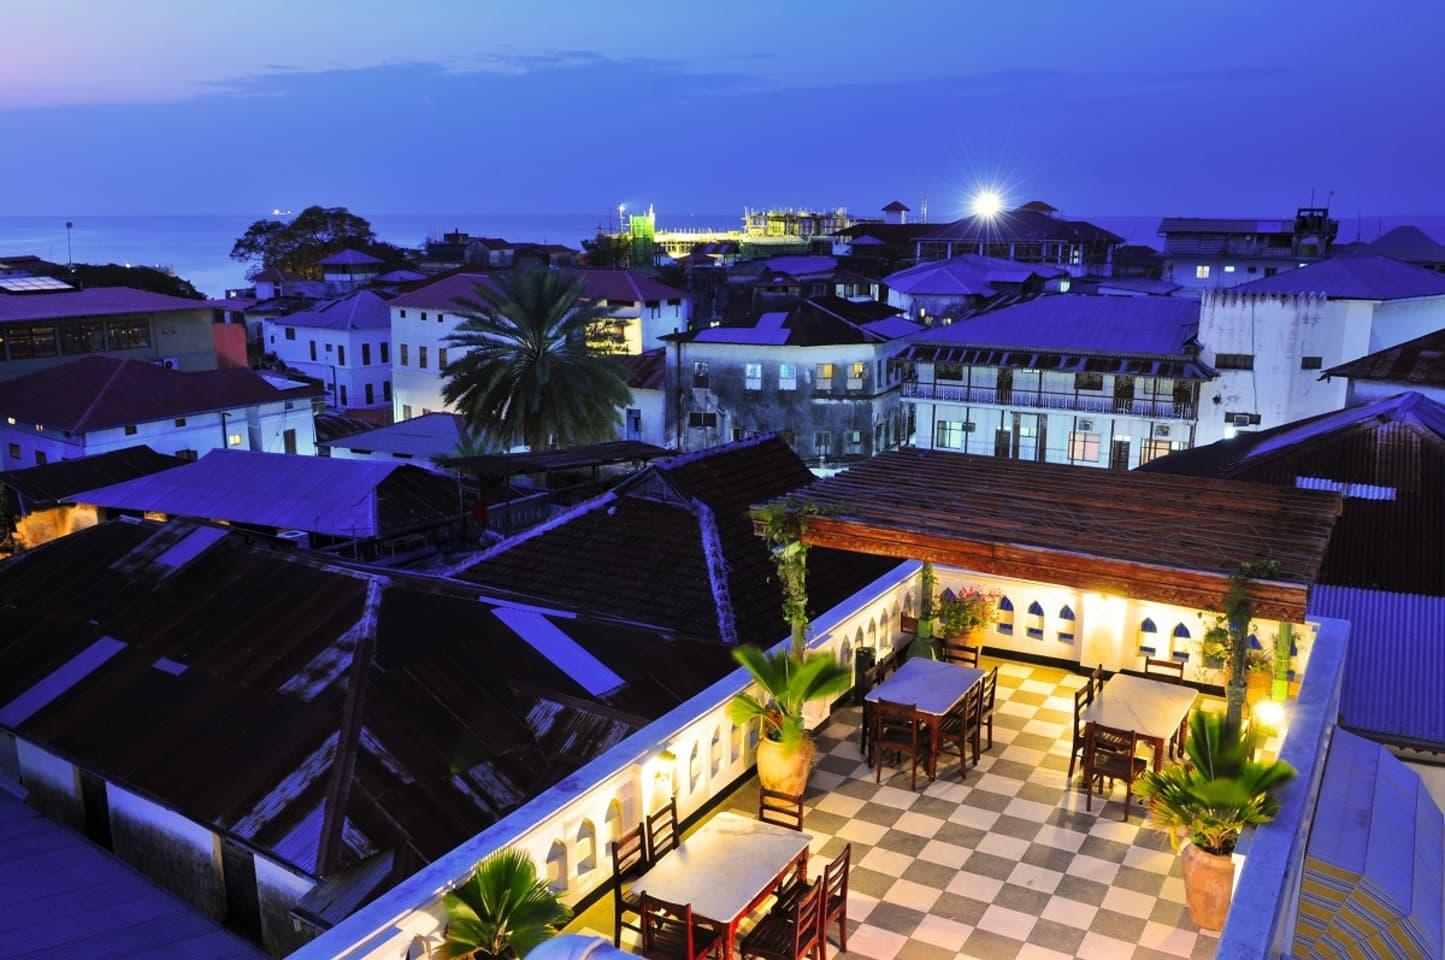 Dhow Palace Hotel 4*, Zanzibar Tanzanie